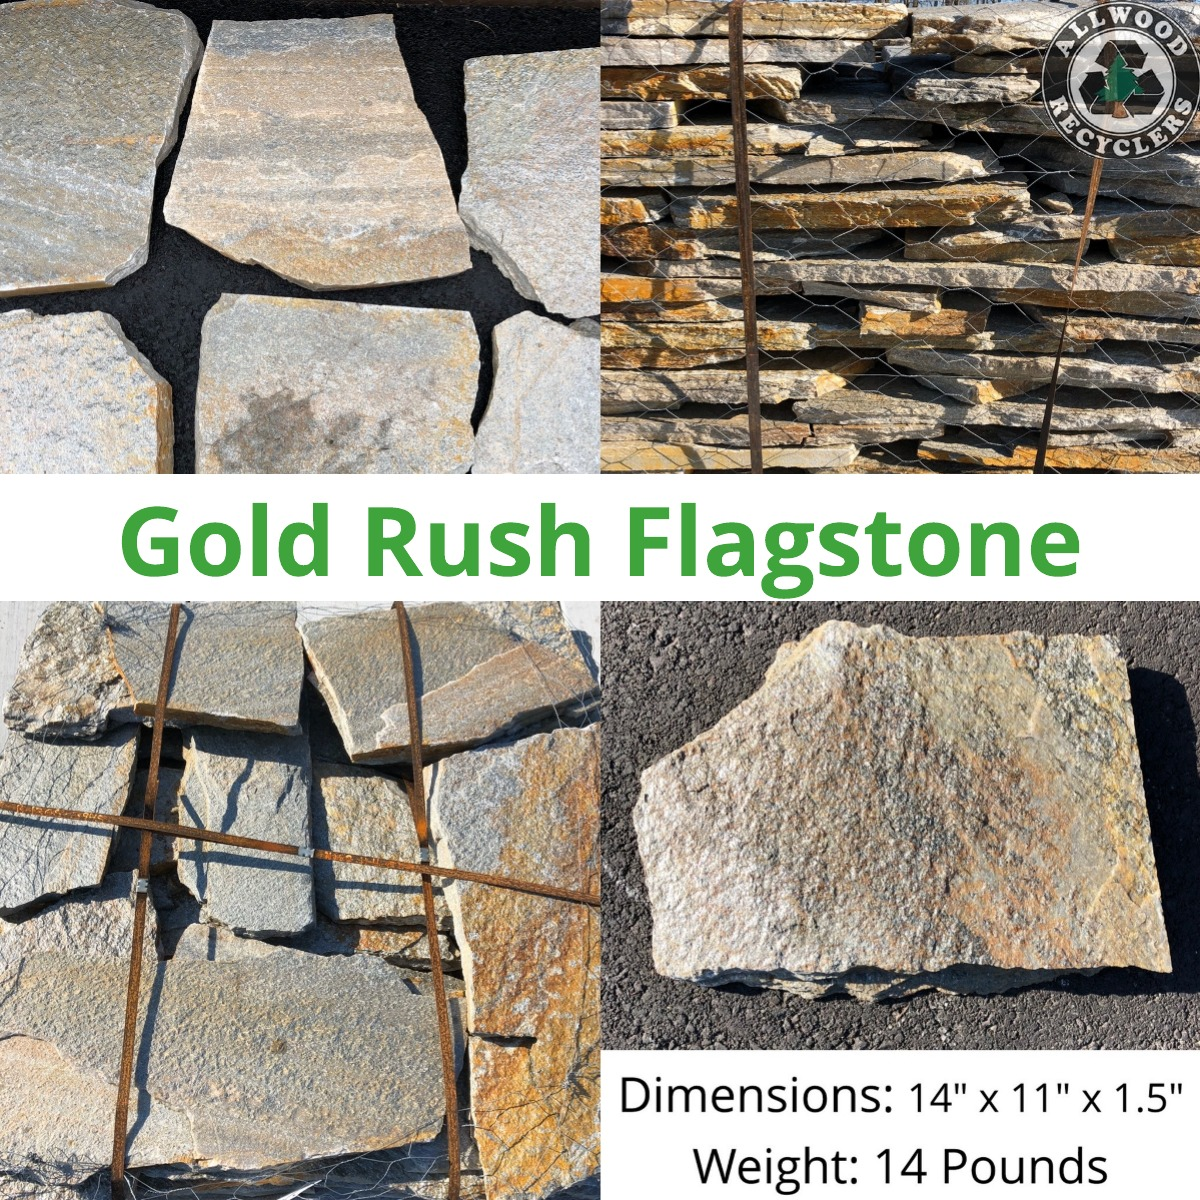 Gold Rush Flagstone